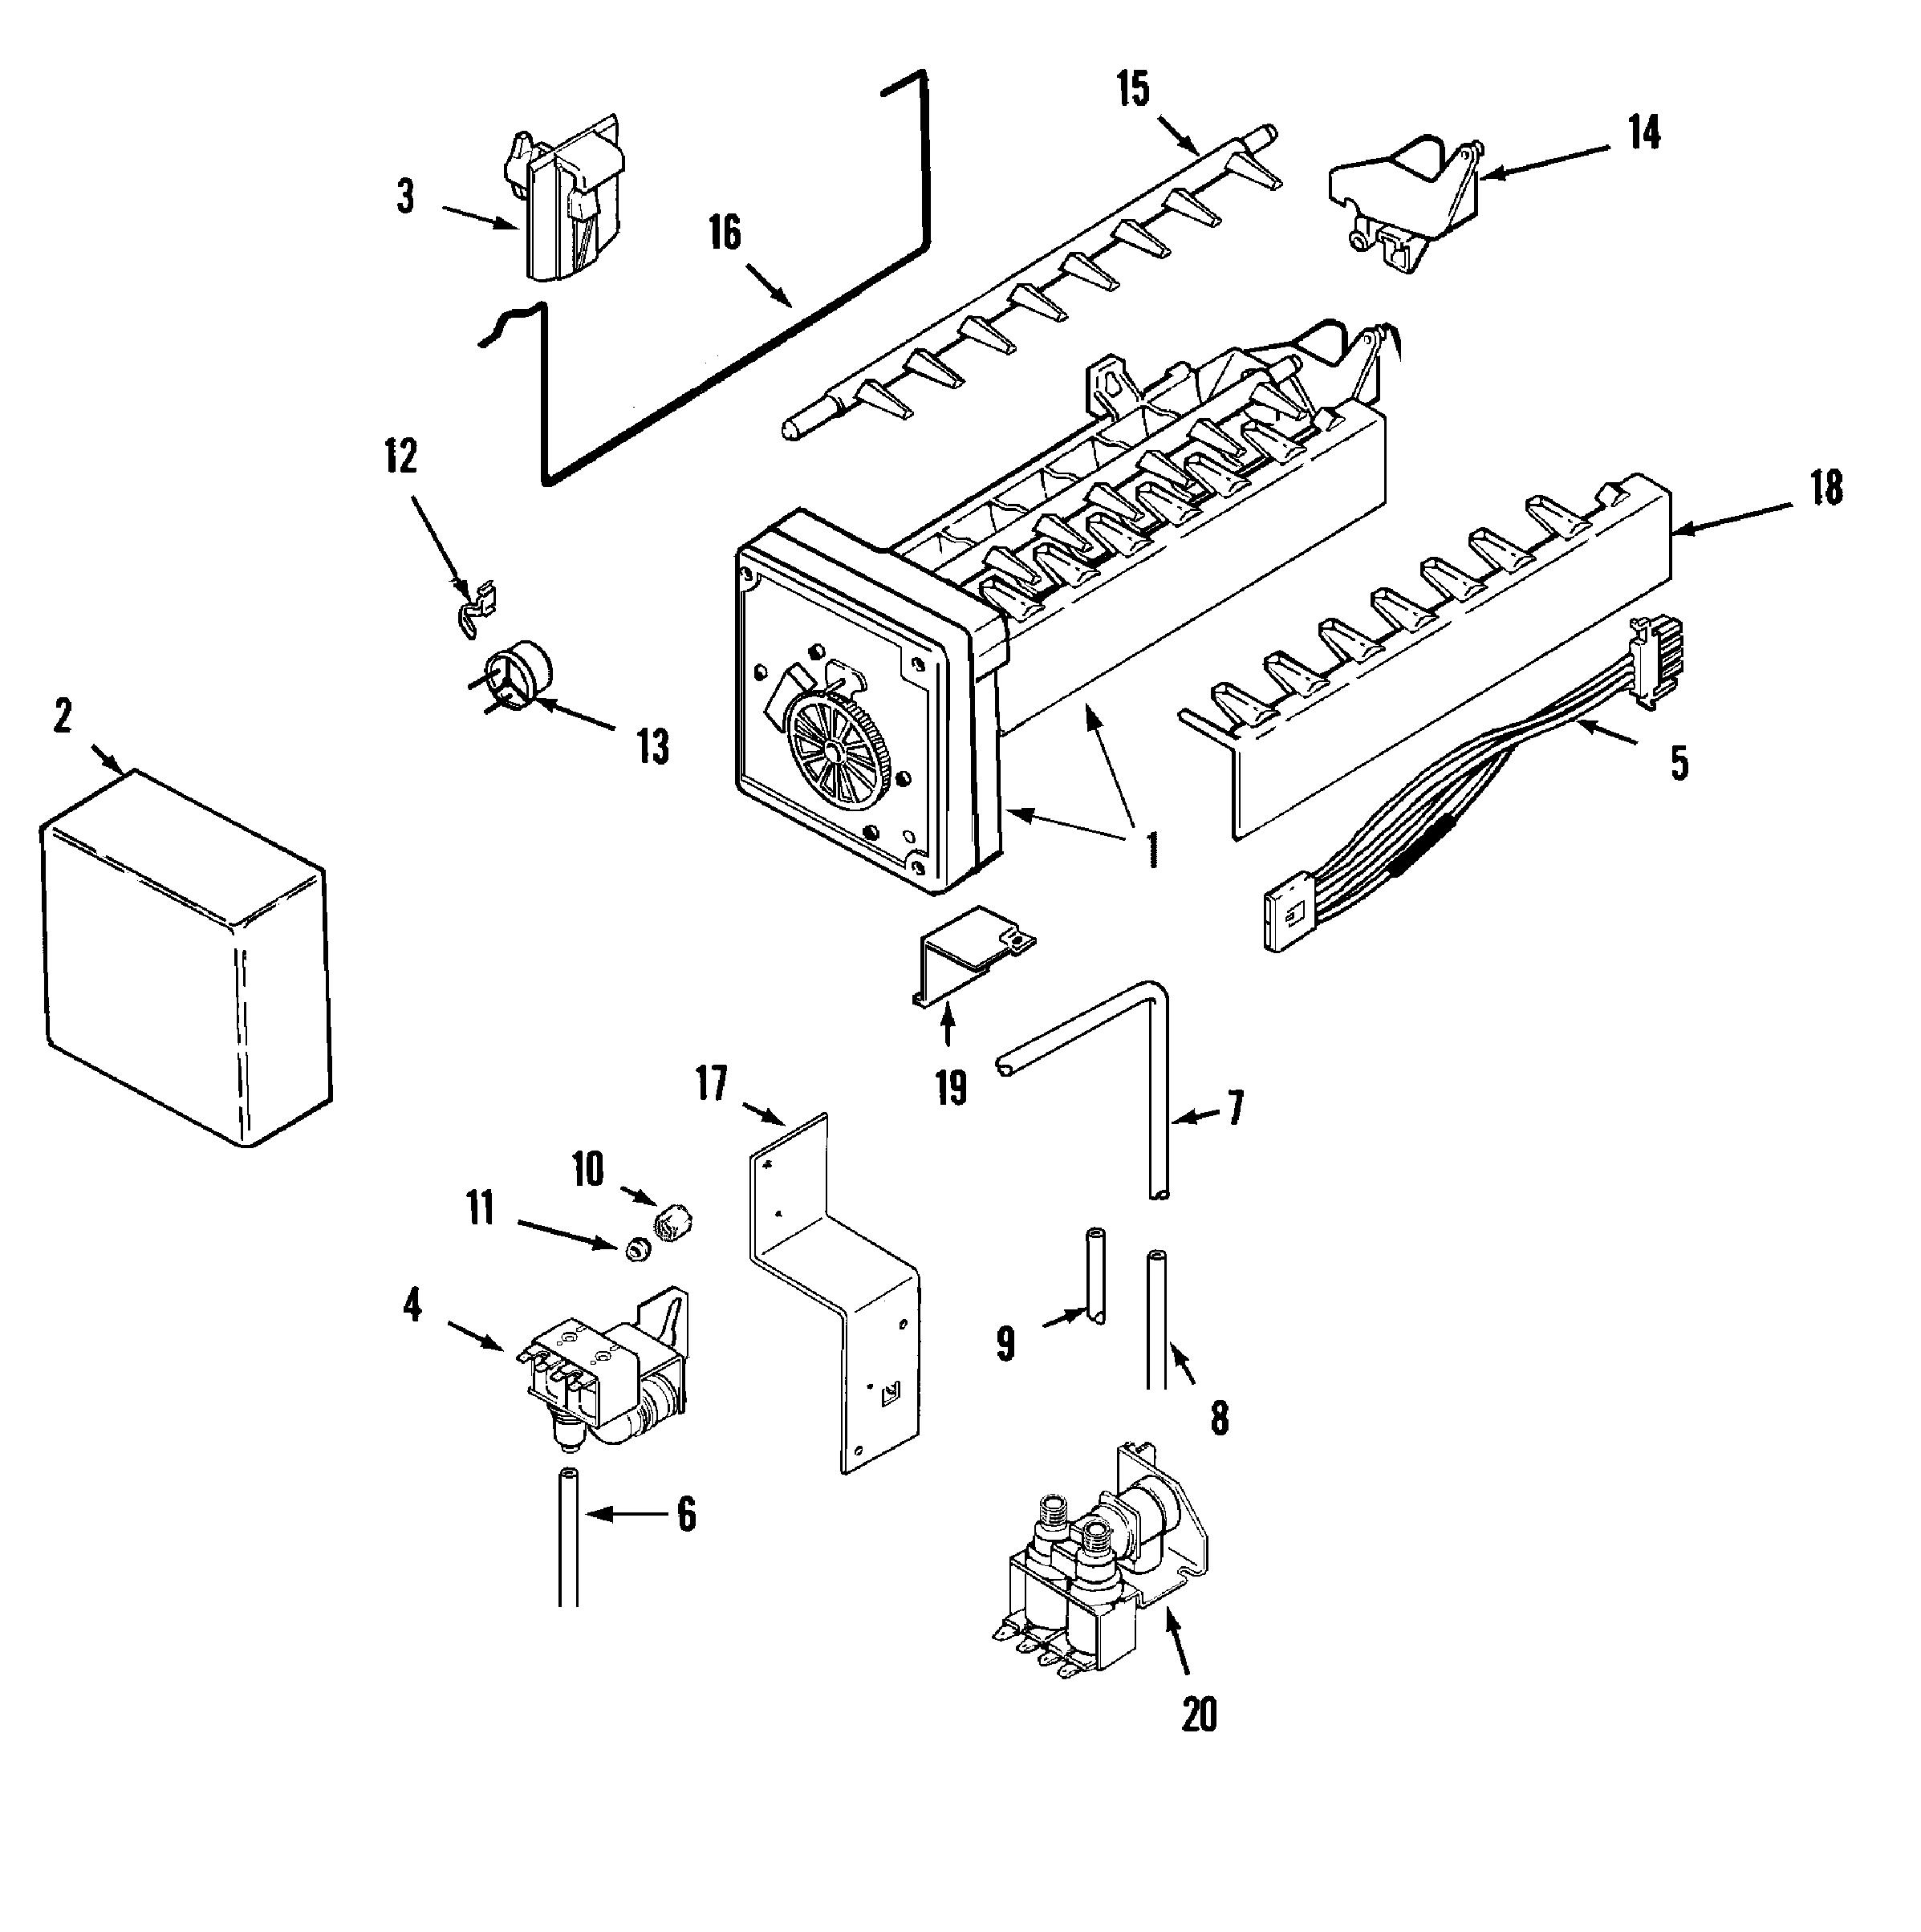 [SCHEMATICS_43NM]  BZ_1484] Viking Oven Wiring Diagram Free Diagram | Viking Professional Refrigerator Wiring Diagram |  | Ophag Ultr Elec Mohammedshrine Librar Wiring 101